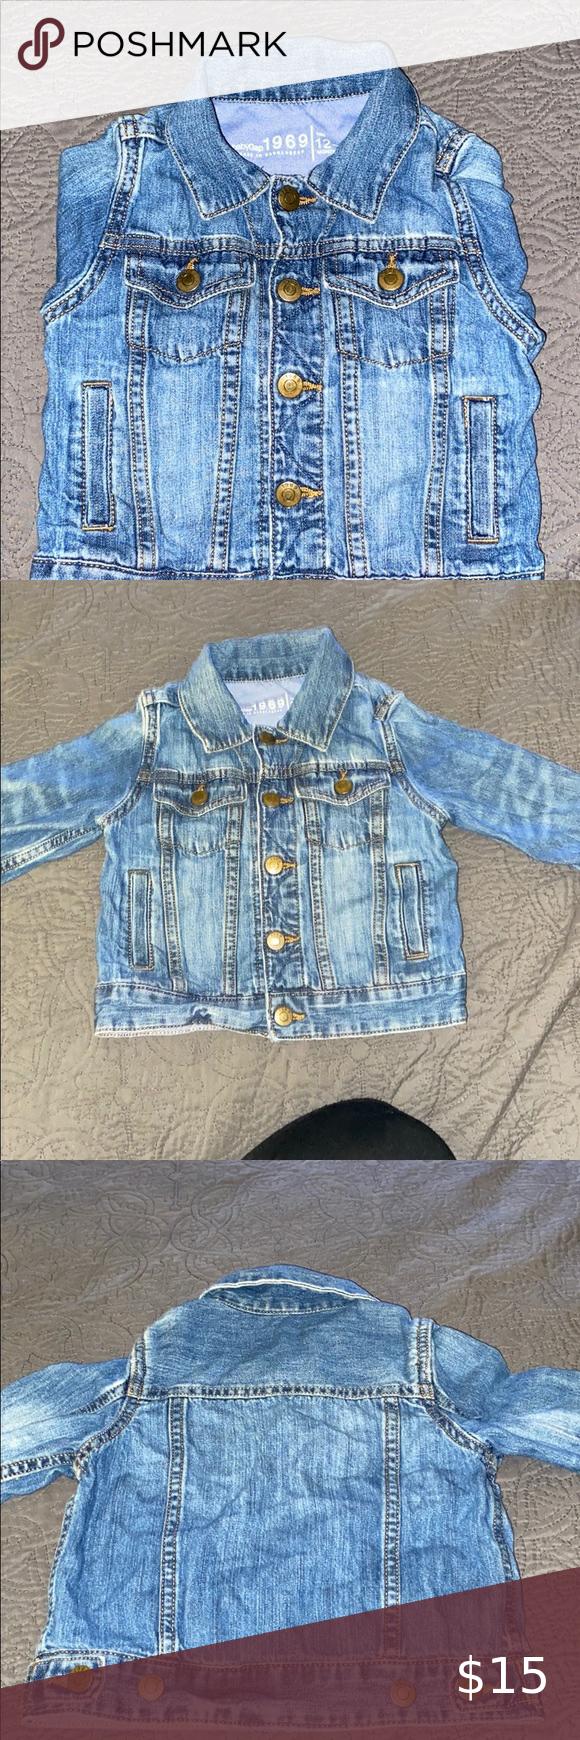 Baby Gap Denim Jacket This Pre Owned Soft Jean Jacket Has Plenty Of Life Left In It No Rips Tears Or Holes In The Ja Gap Denim Jacket Gap Denim Denim Jacket [ 1740 x 580 Pixel ]